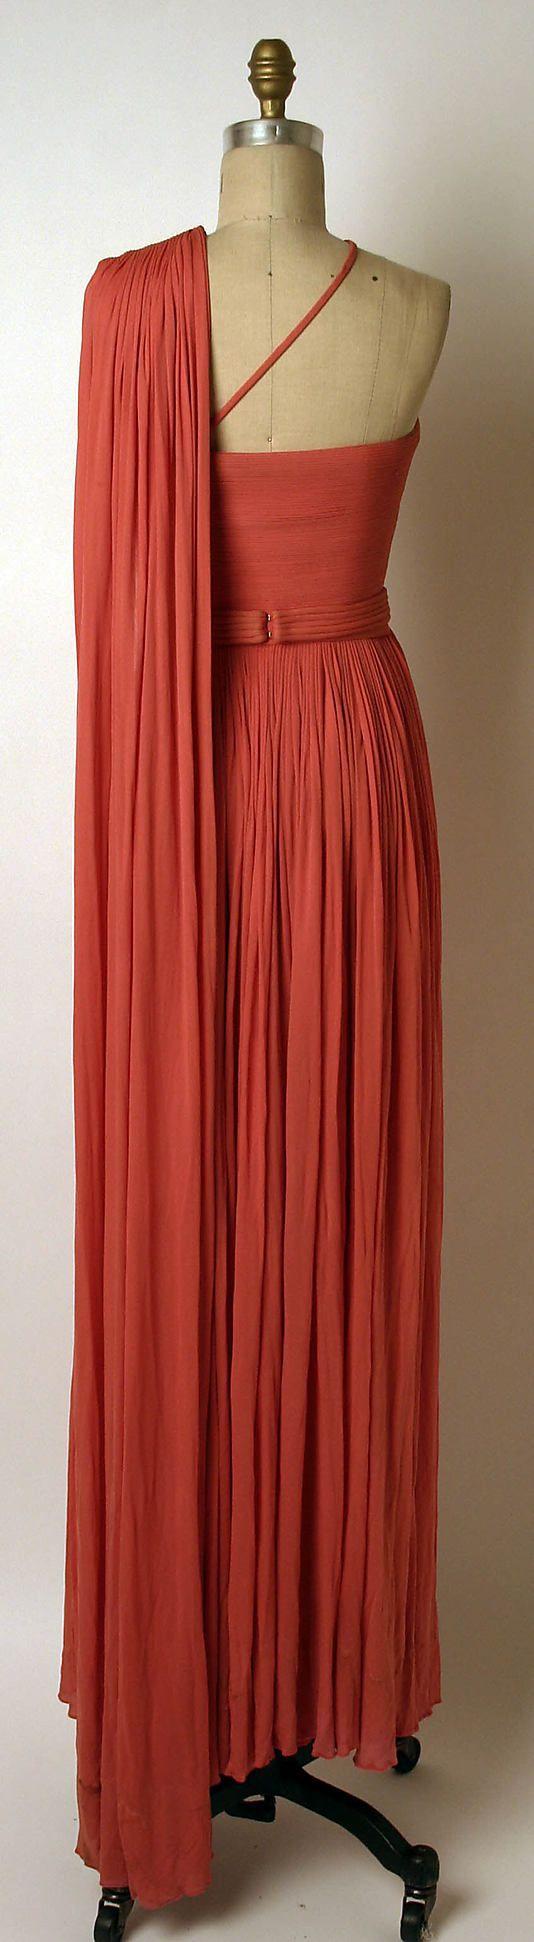 Dress Madame Grès (Alix Barton)  (French, Paris 1903–1993 Var region)   Date: ca. 1967 Culture: French Medium: a,b) silk. Back